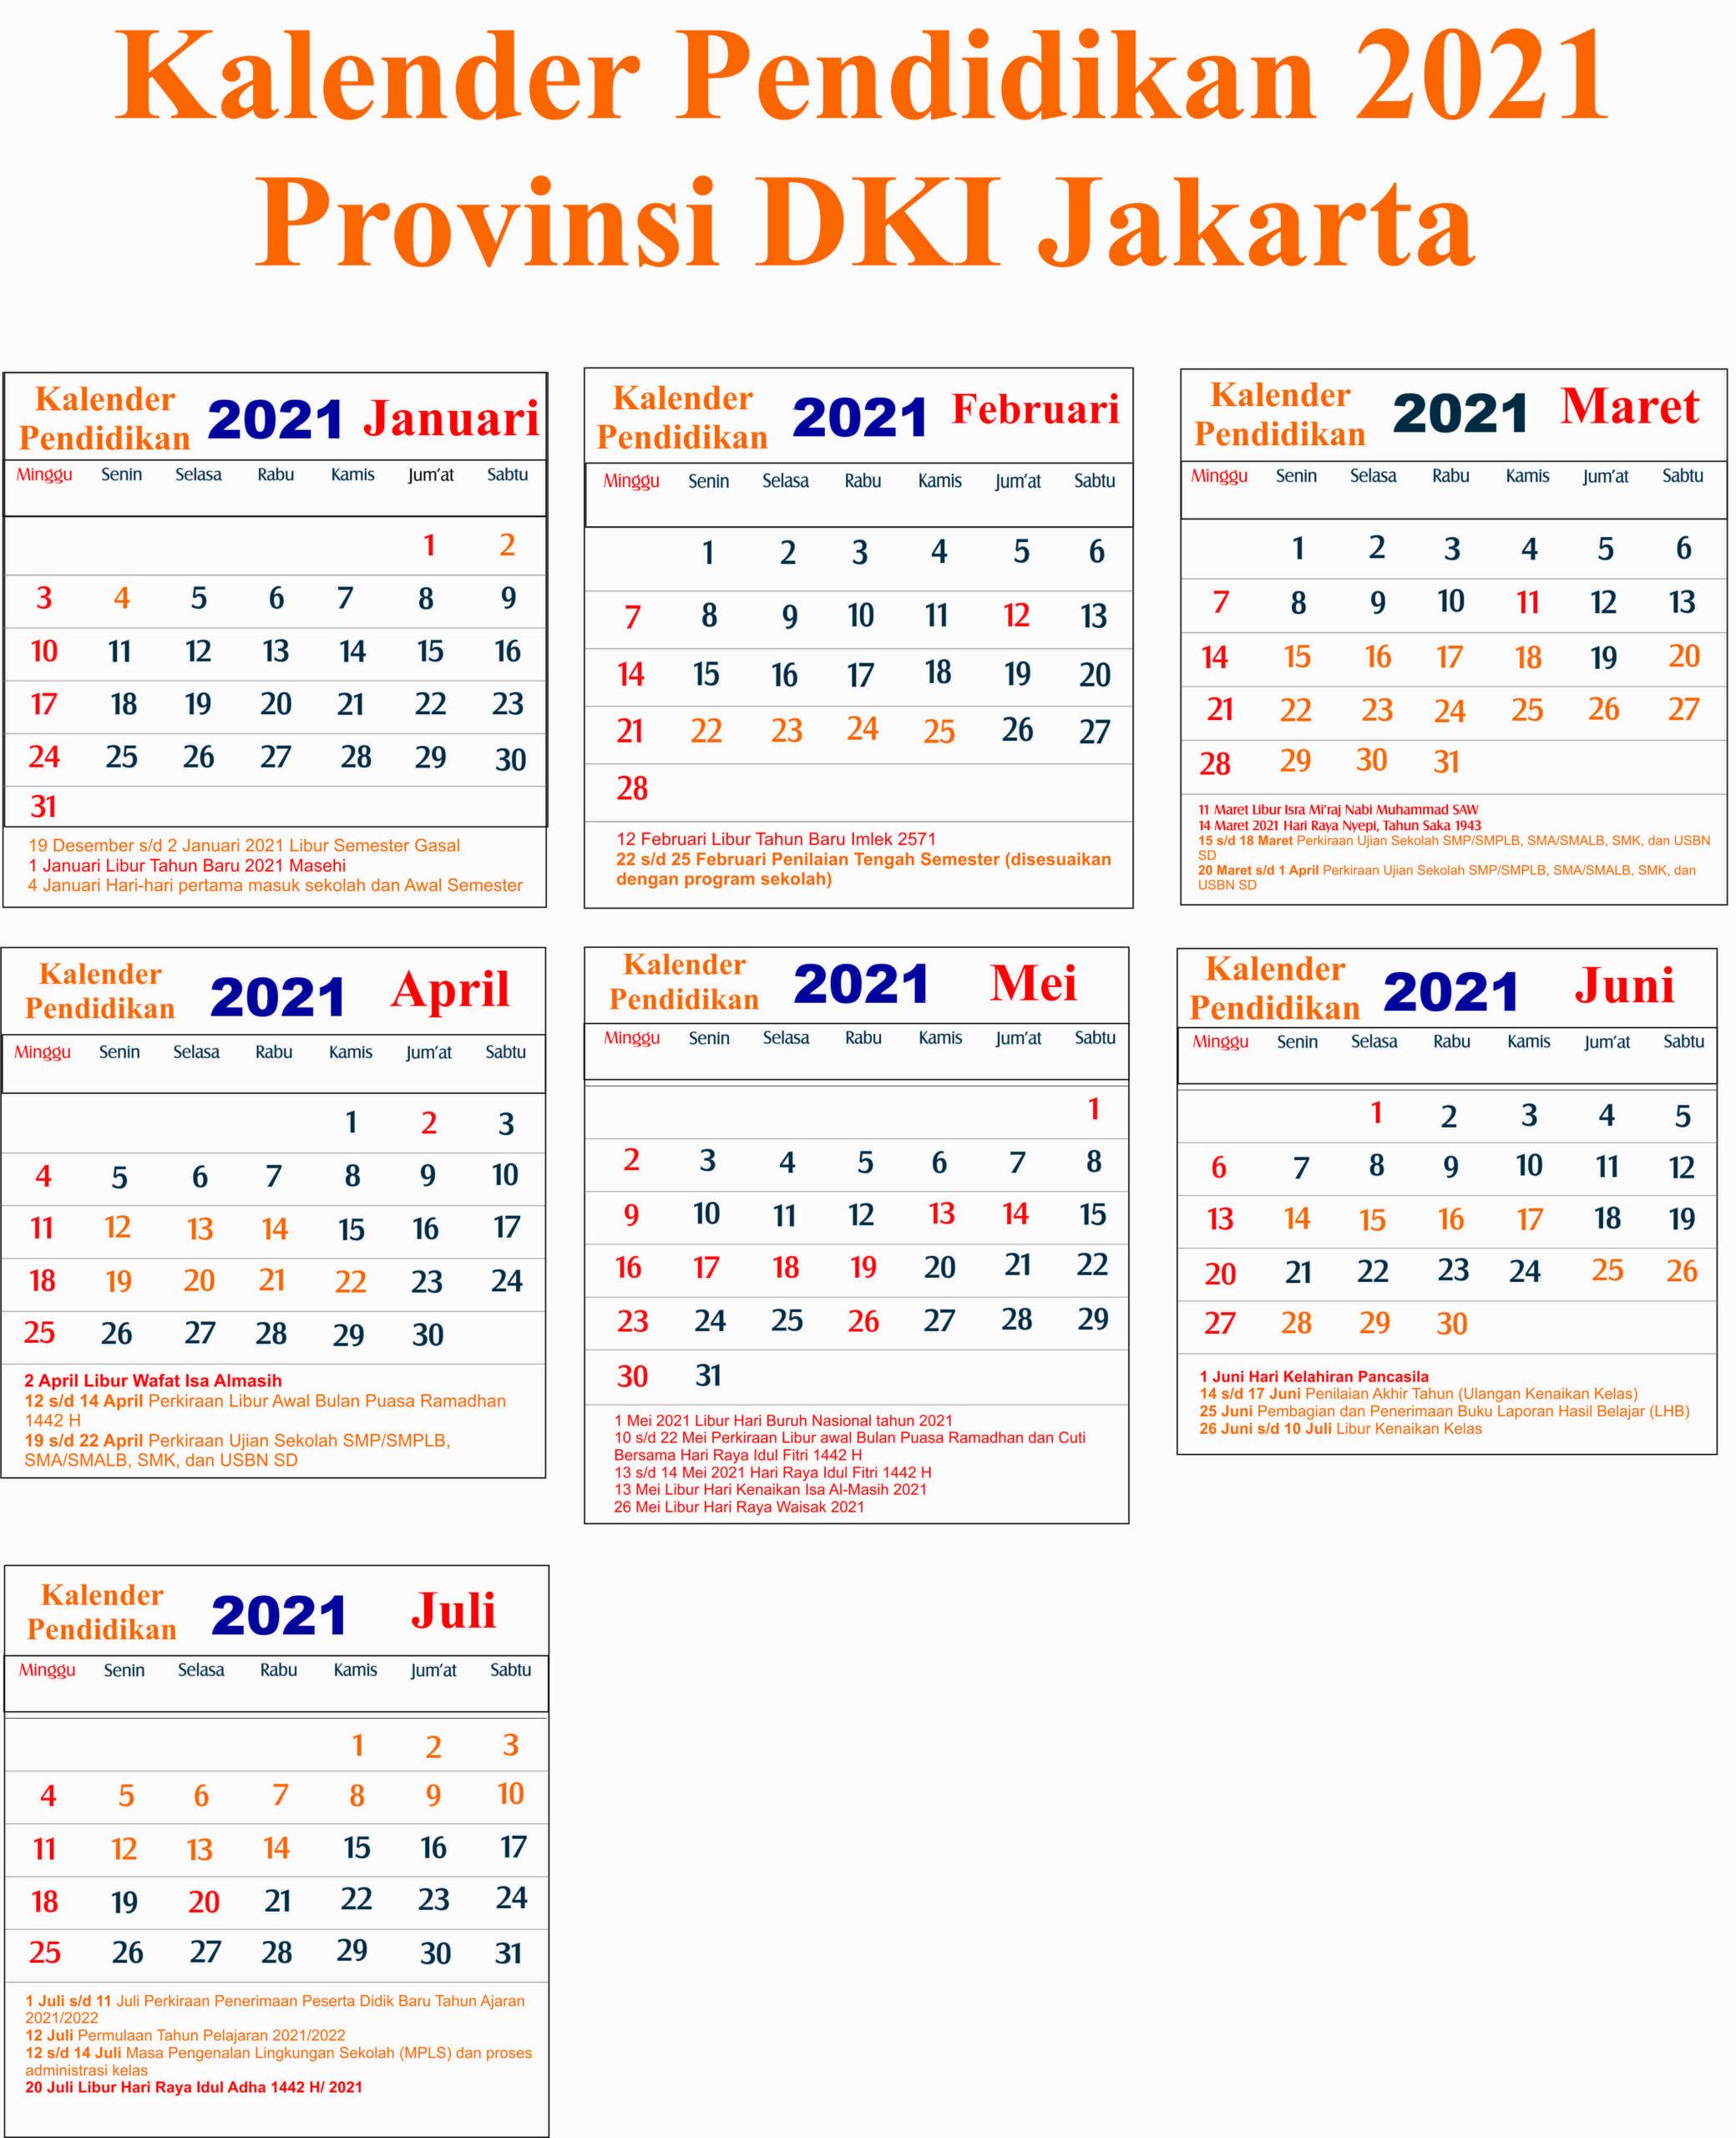 kalender pendidikan 2021 dki jakarta